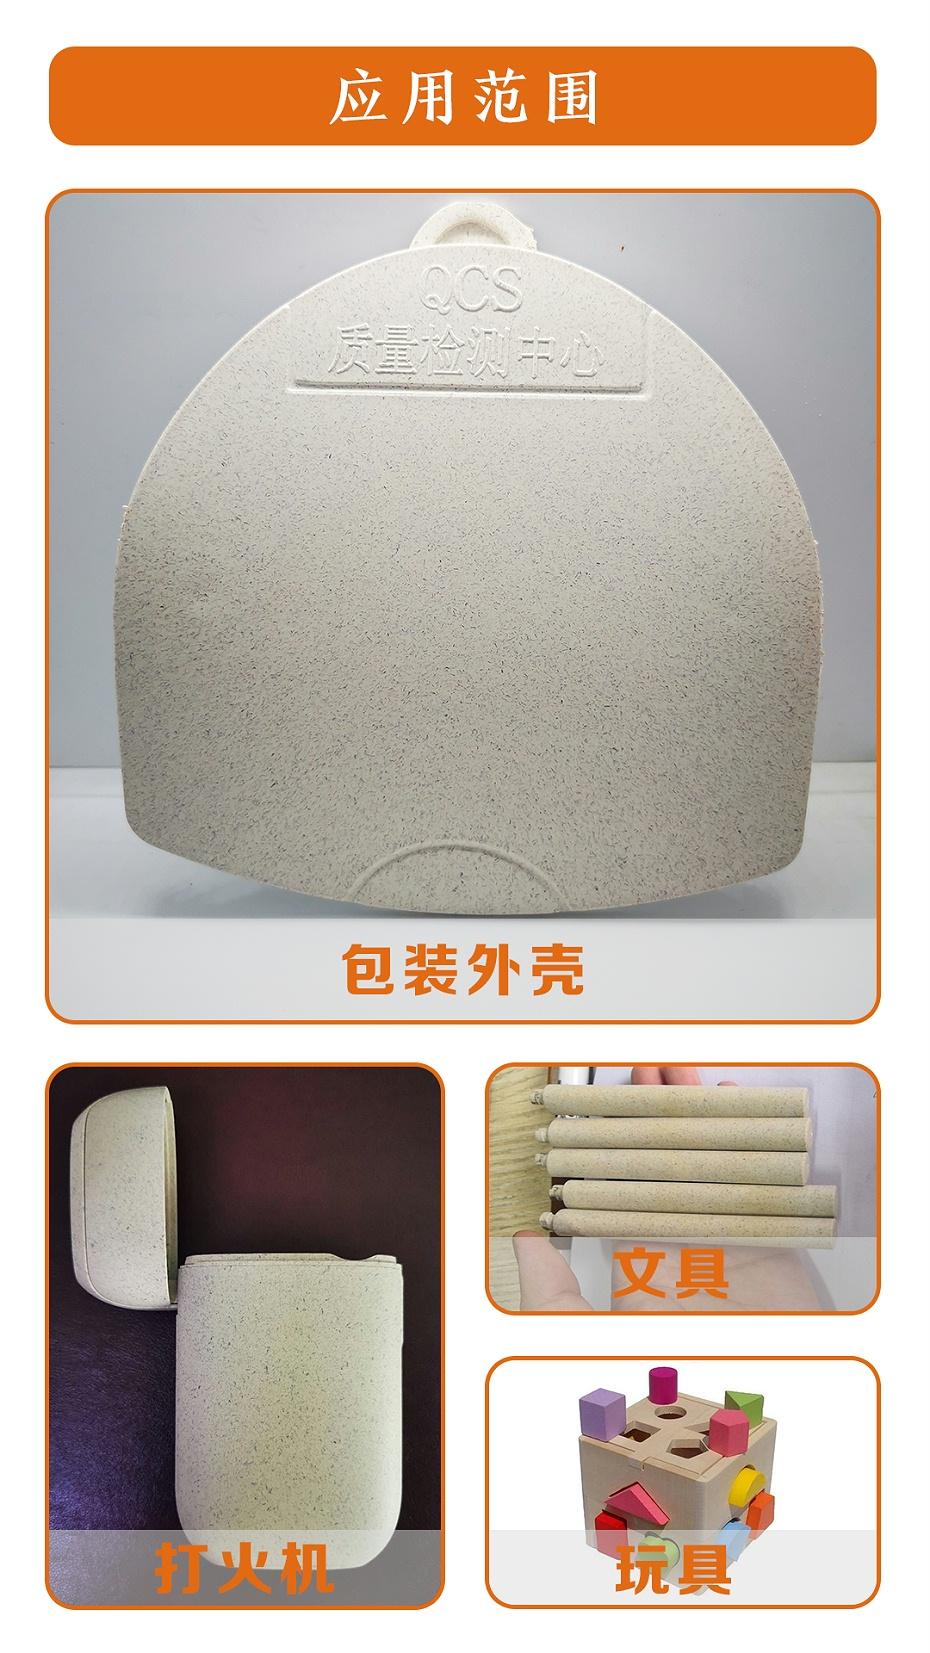 PP竹纤维应用图片